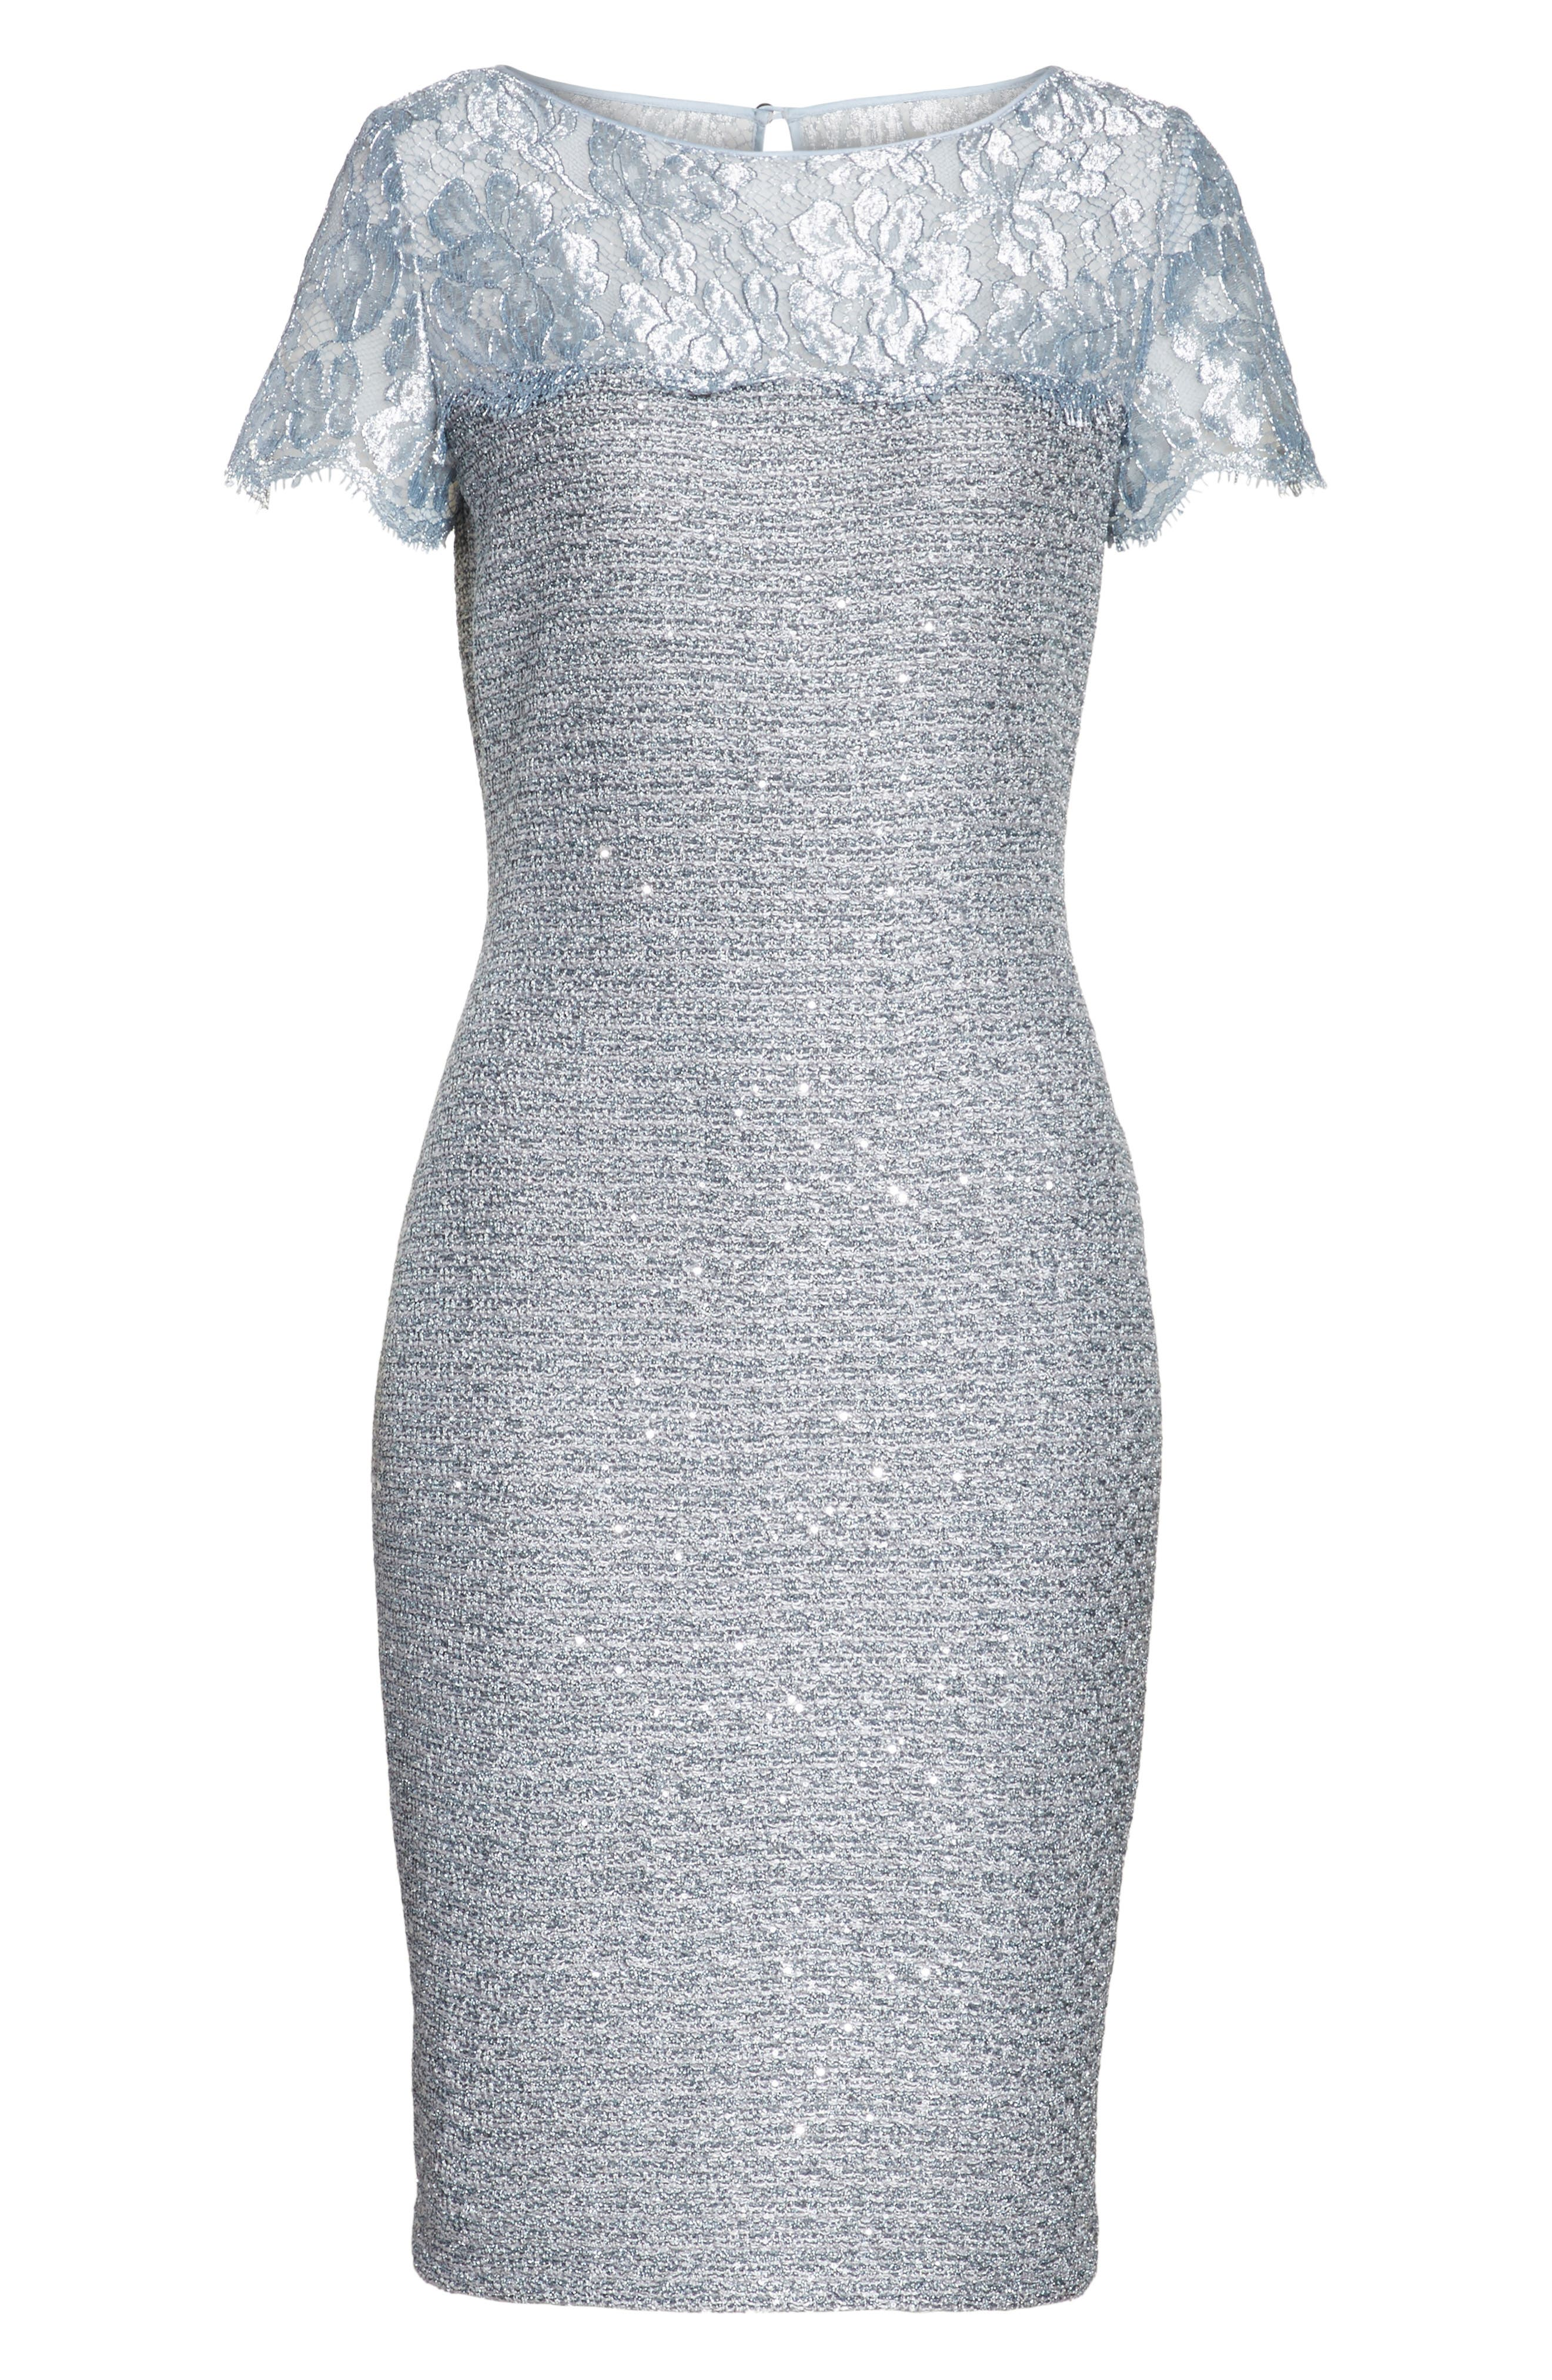 Metallic Sequin Knit Dress,                             Alternate thumbnail 6, color,